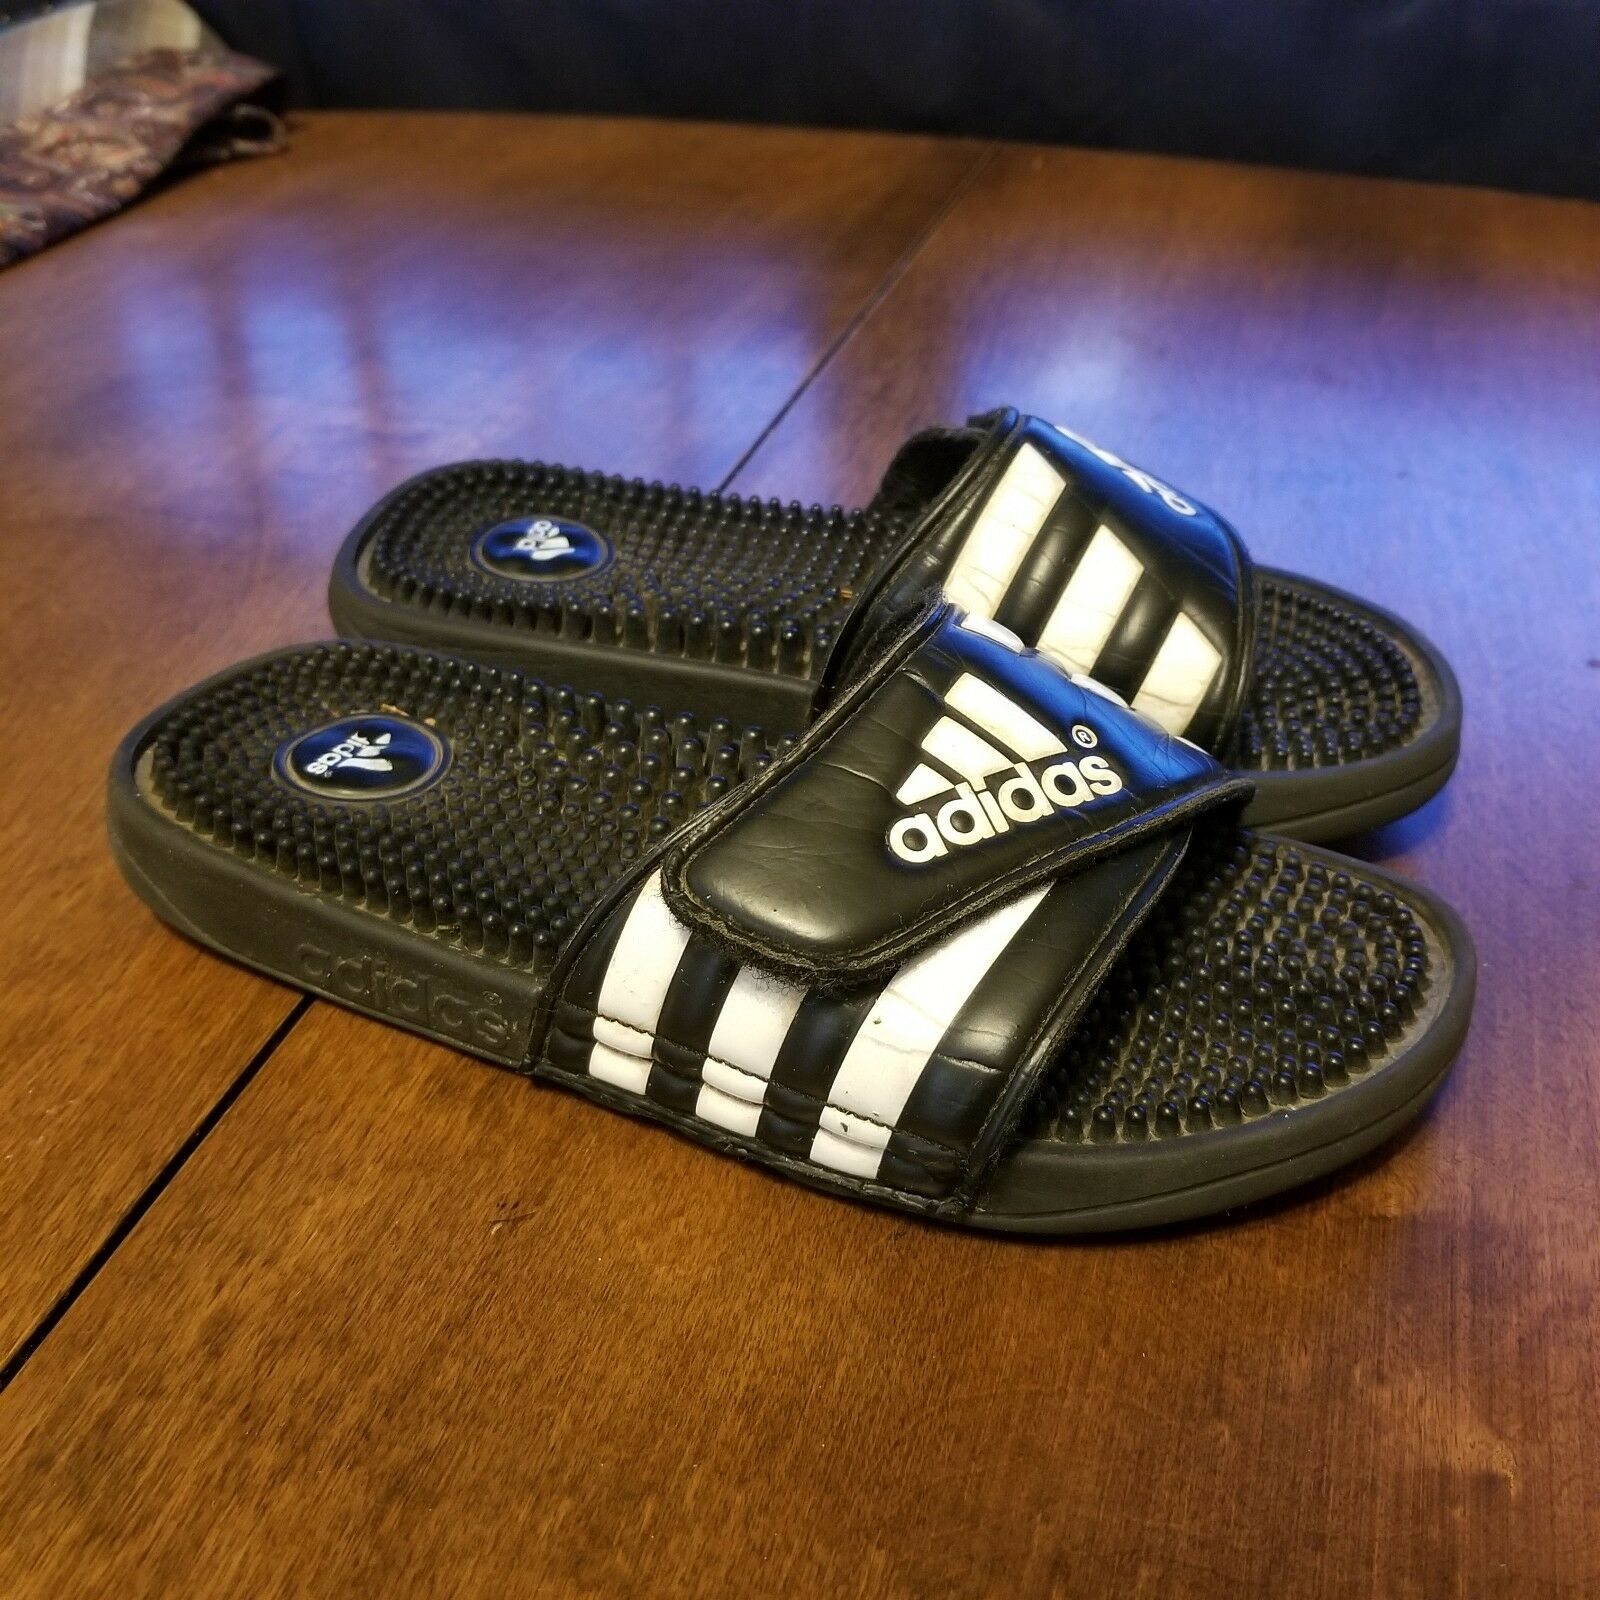 B39 adidas nero diapositive doccia athletic sport sandali sandali sandali numero 5   Elegante Nello Stile  054706